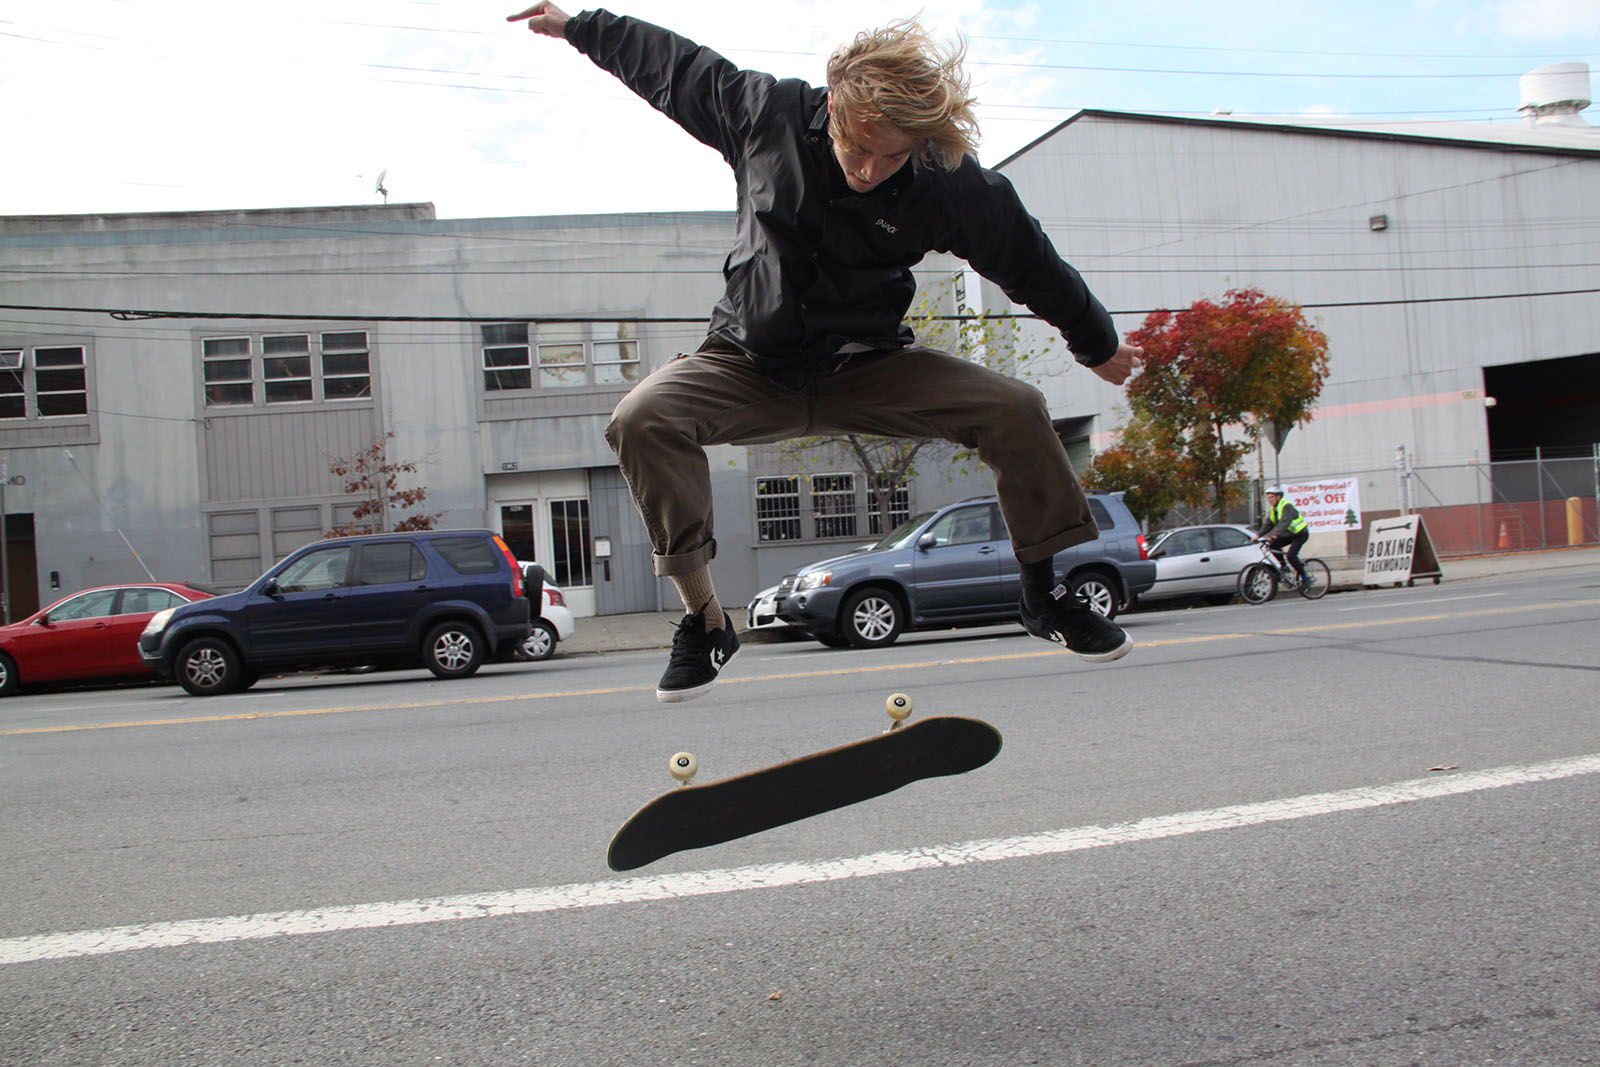 SNAP: Kick Flip